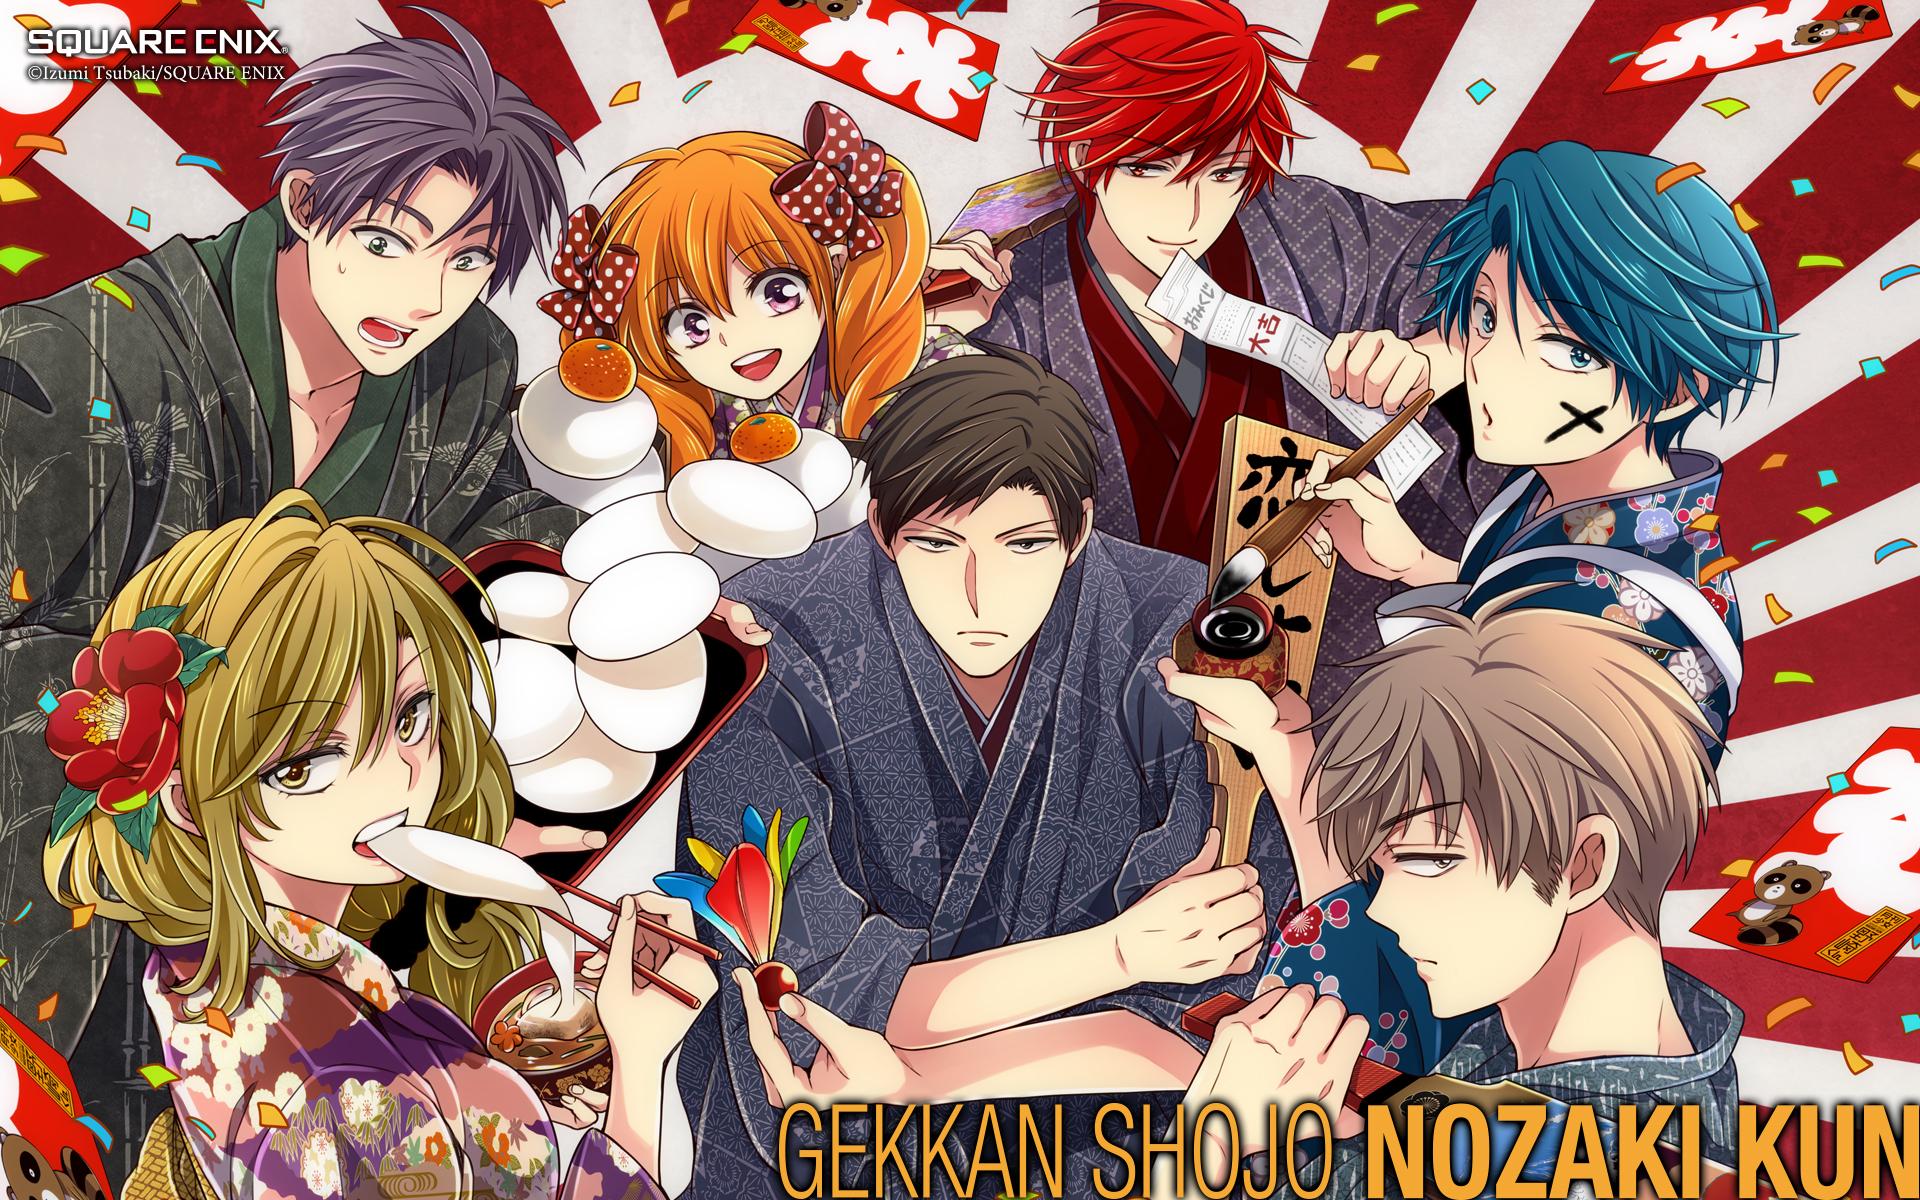 Gekkan Shoujo Nozaki Kun Monthly Girls Nozaki Kun Wallpaper